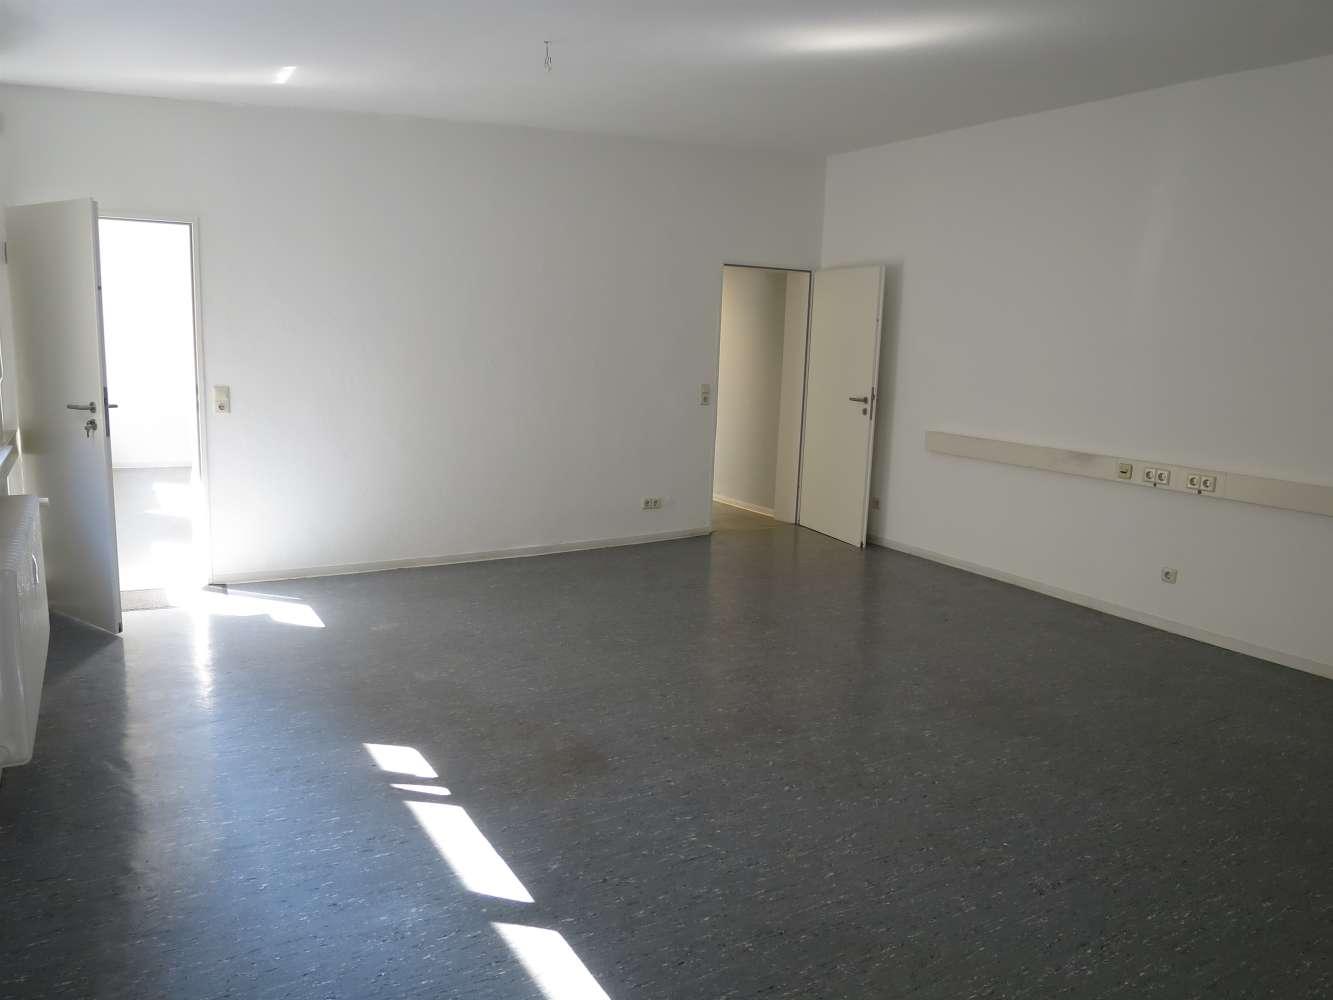 Büros Frankfurt am main, 60318 - Büro - Frankfurt am Main - F2425 - 10611547